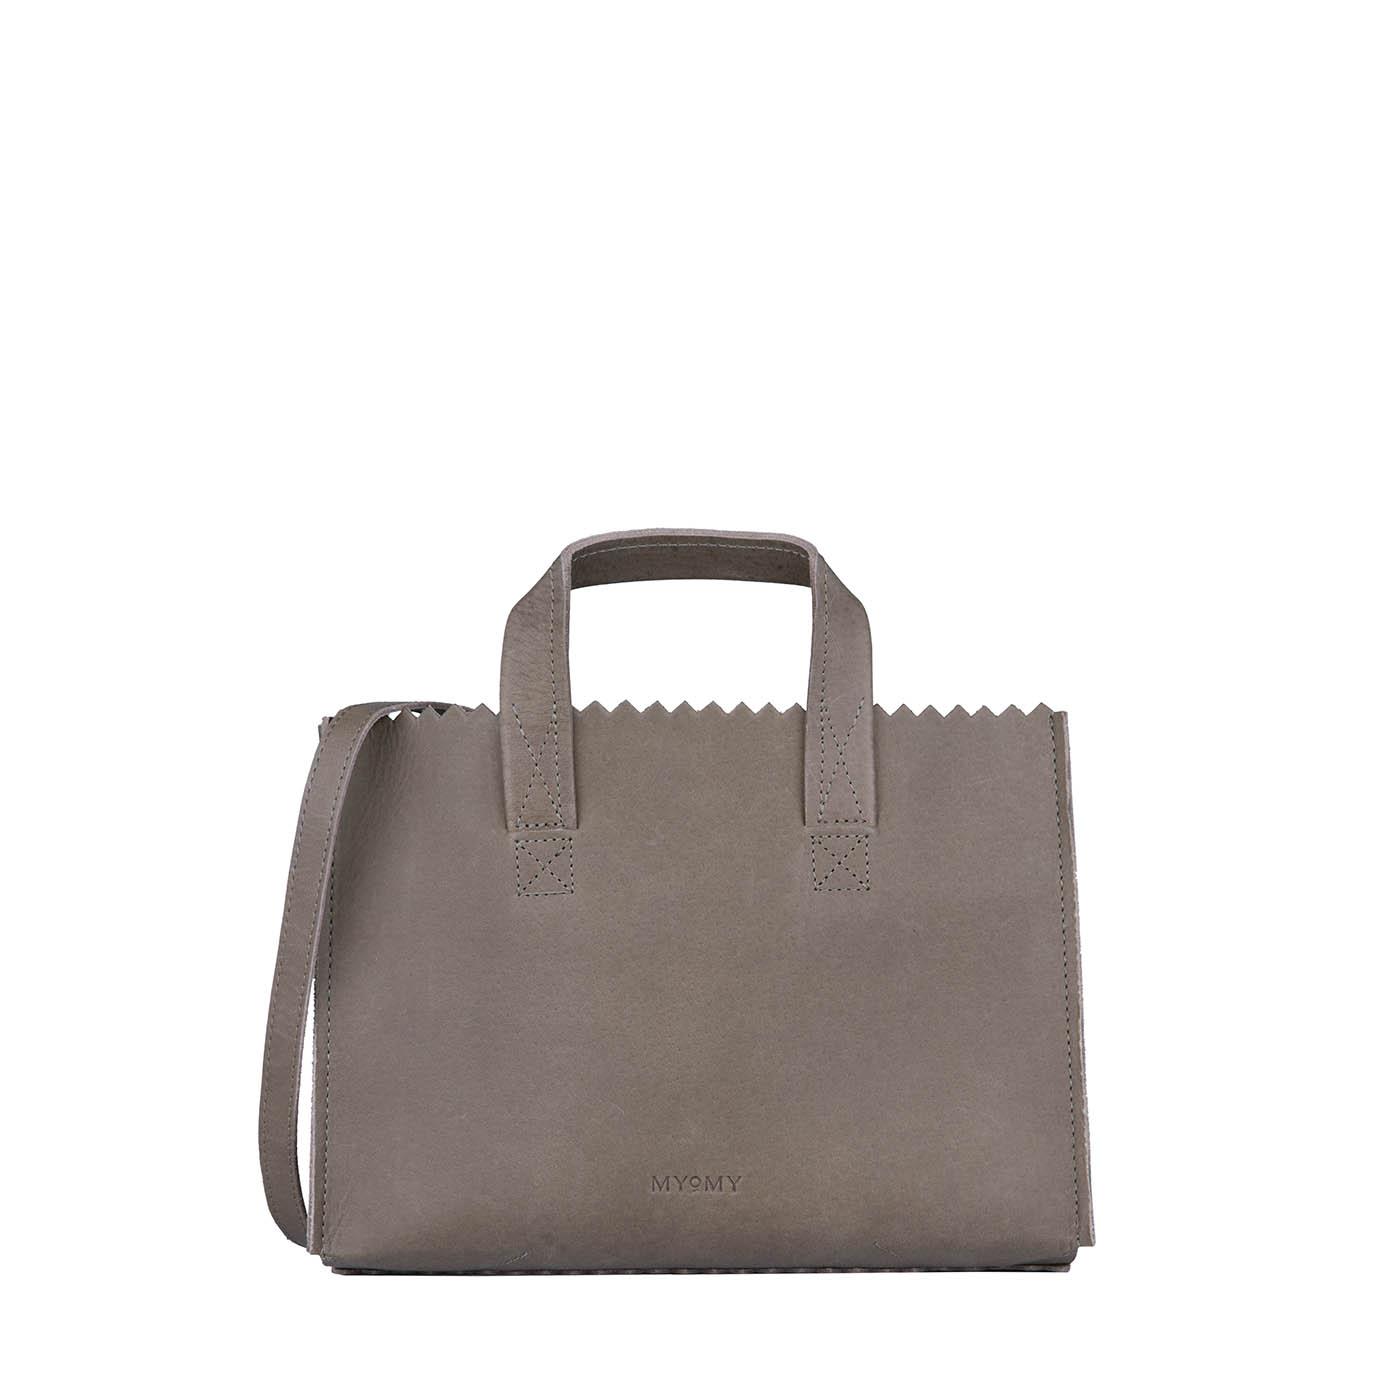 MY PAPER BAG Mini handbag cross-body - hunter taupe